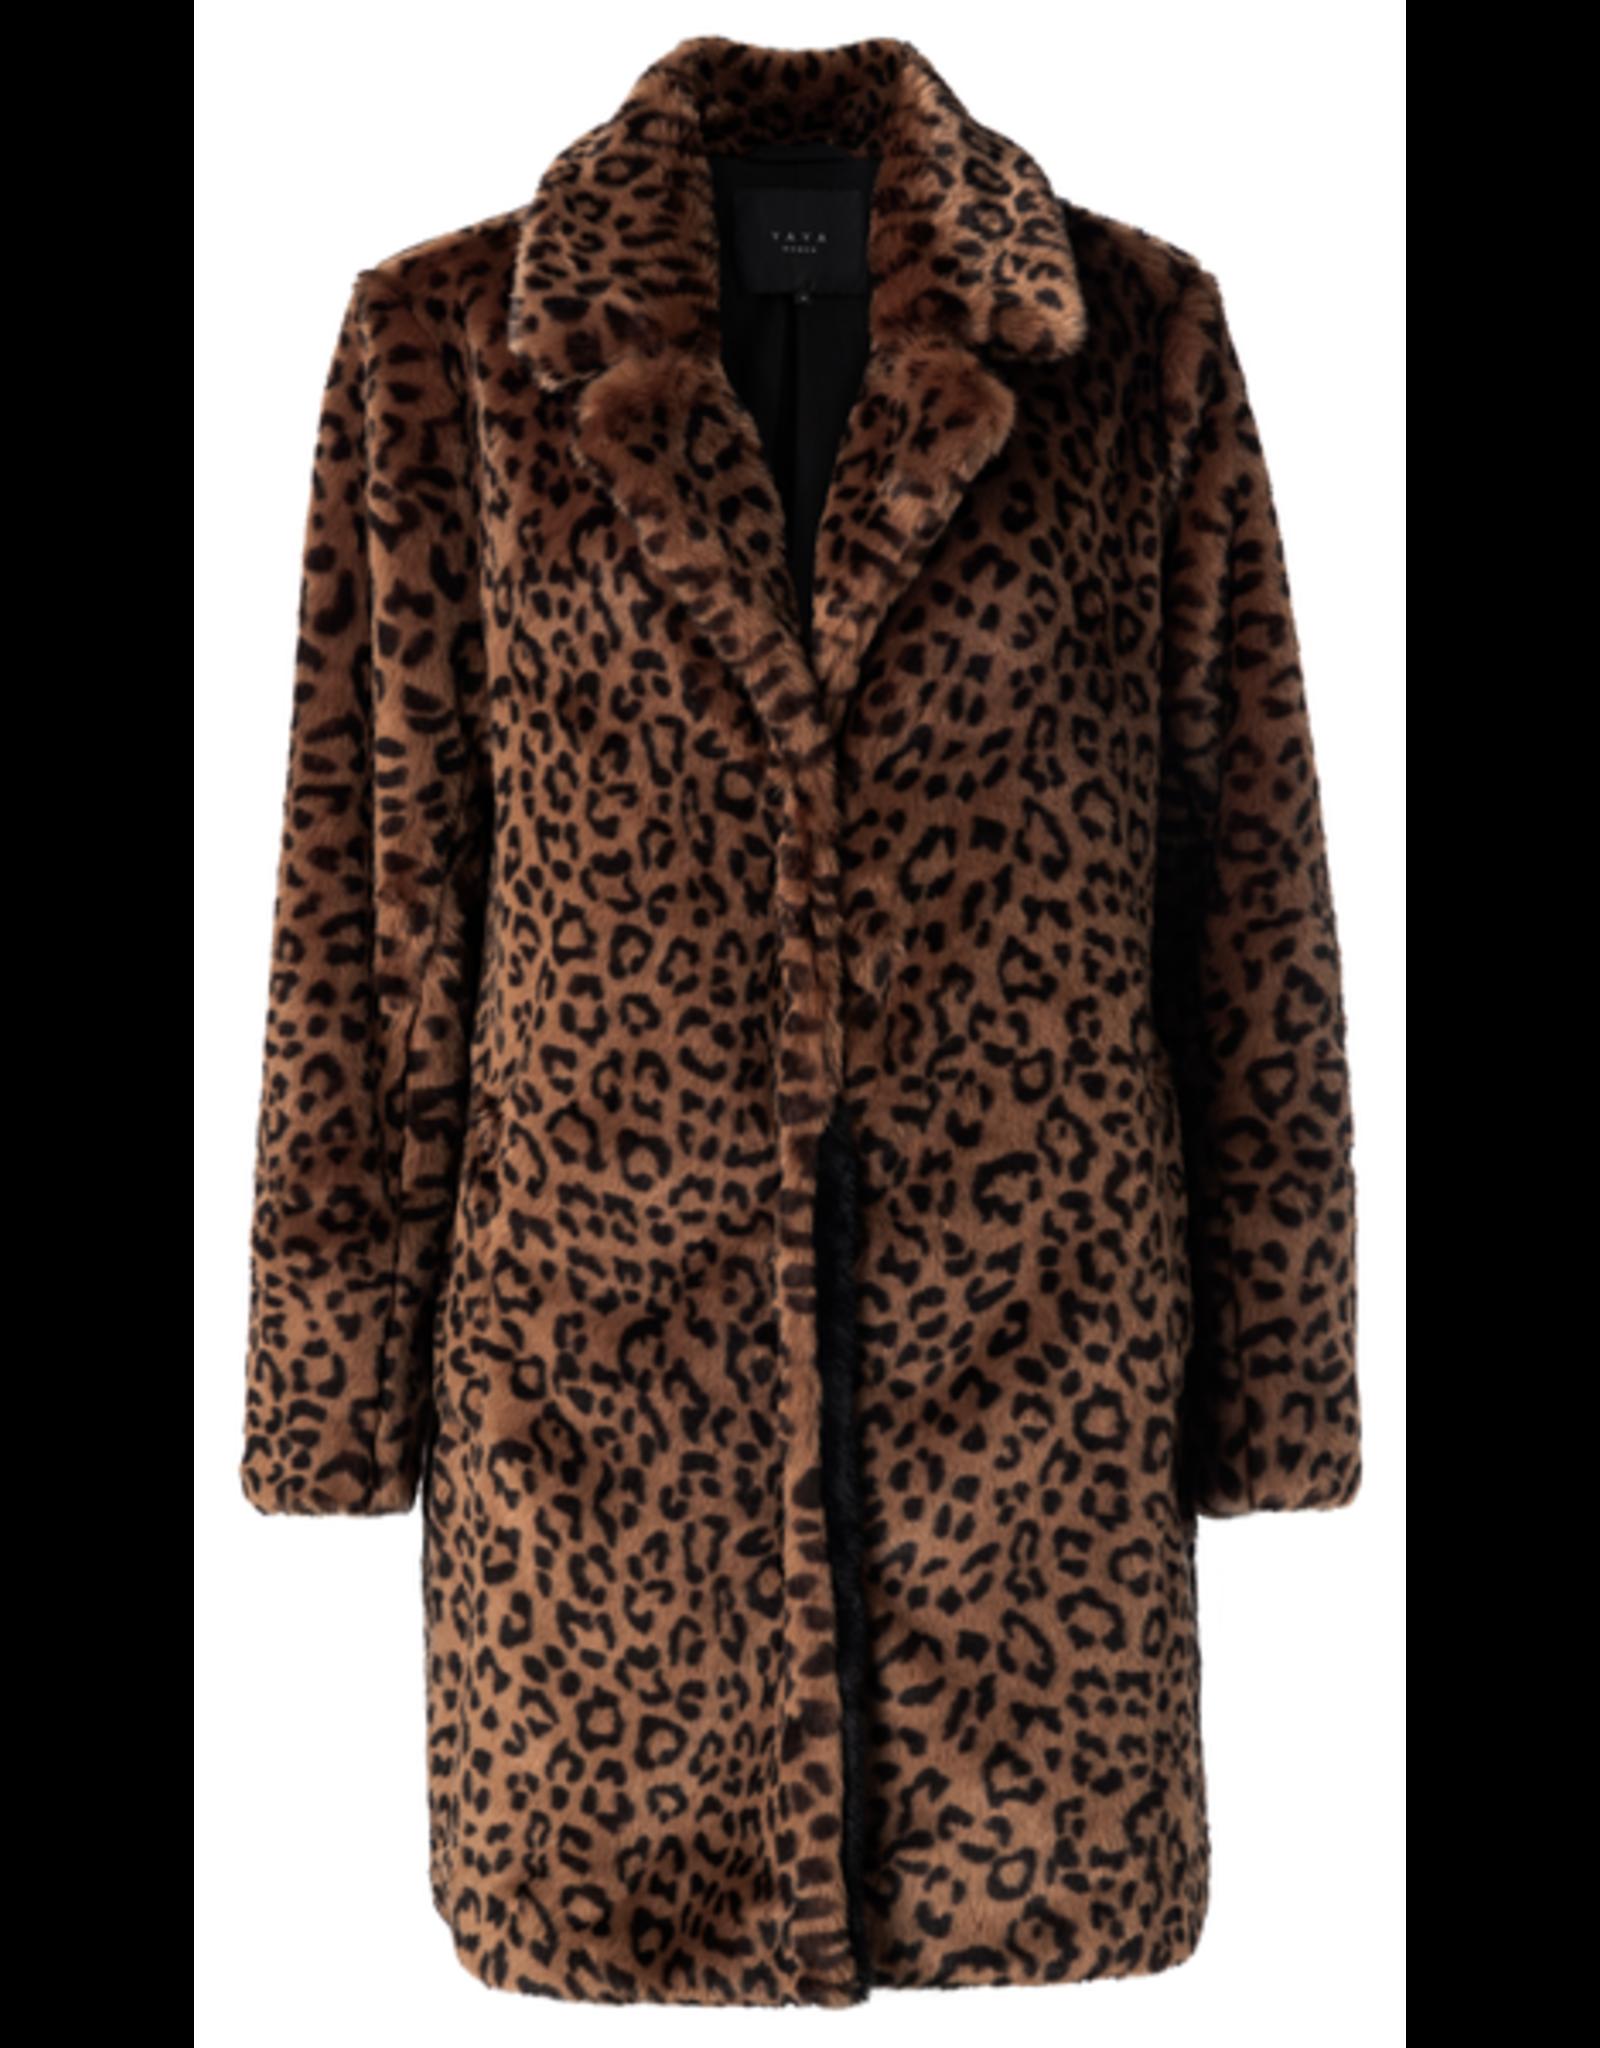 Yaya YAYA Faux Fur coat Brown dessin